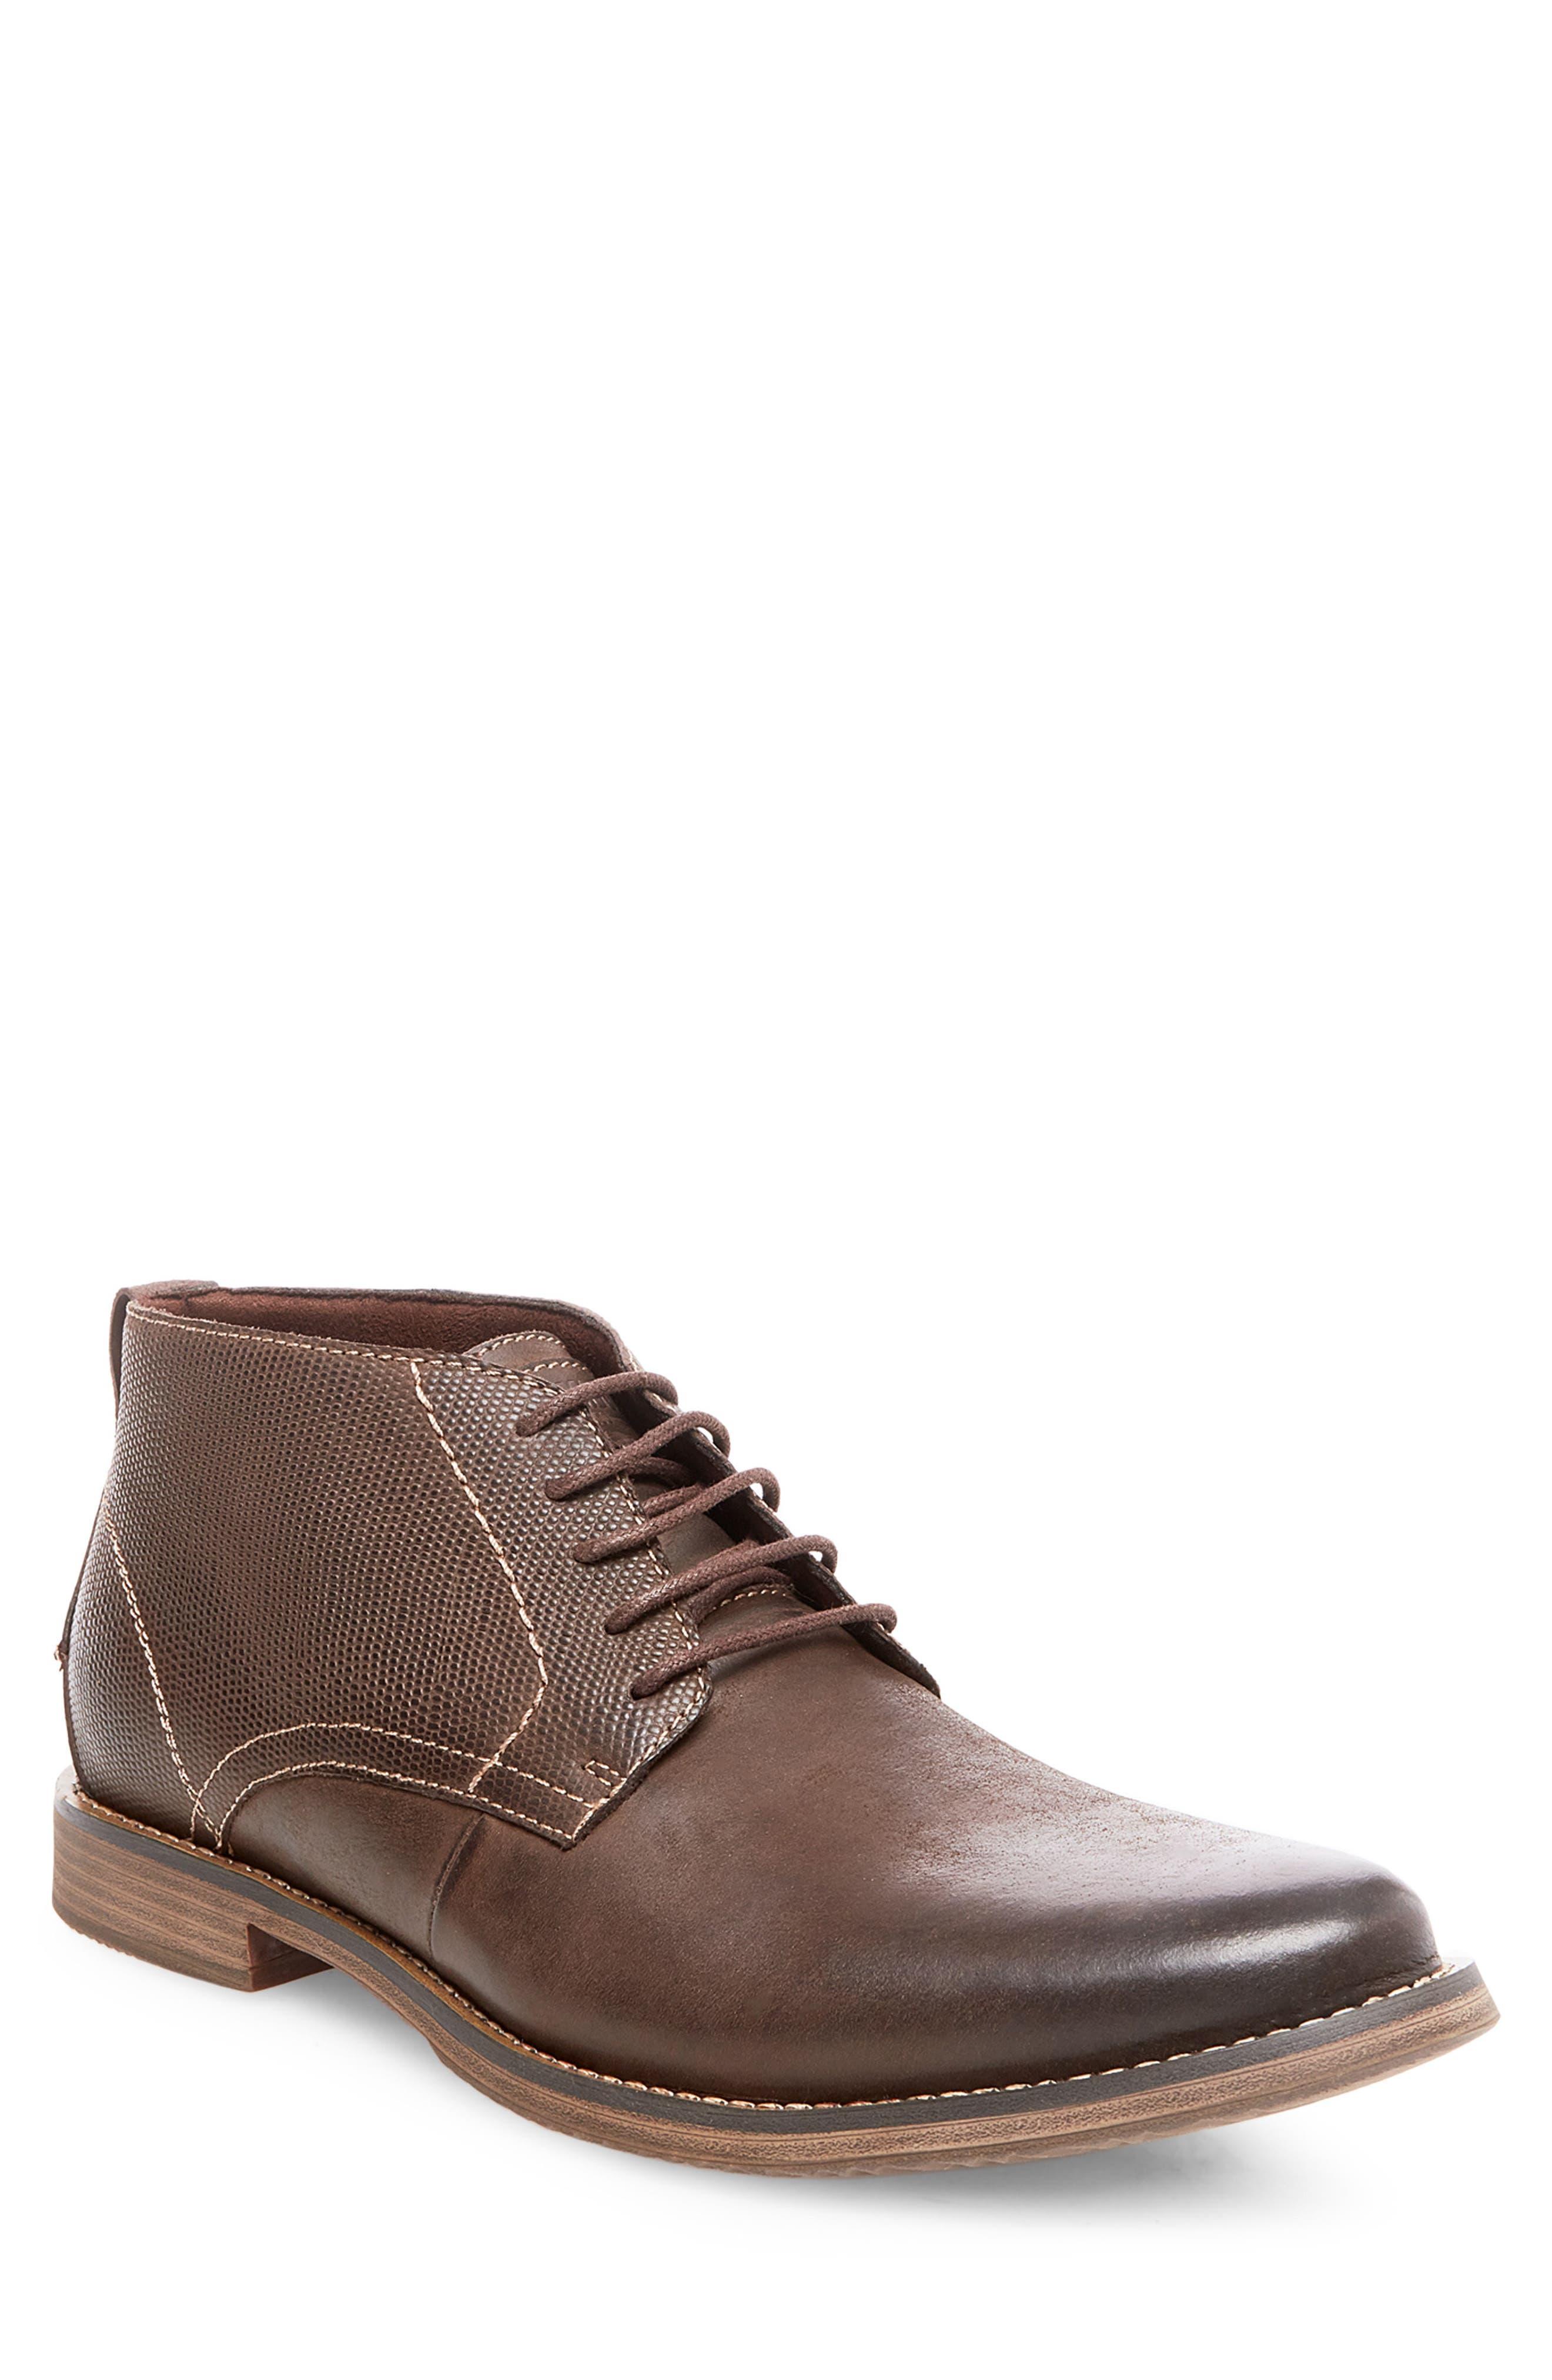 Pieter Leather Chukka Boot,                             Main thumbnail 1, color,